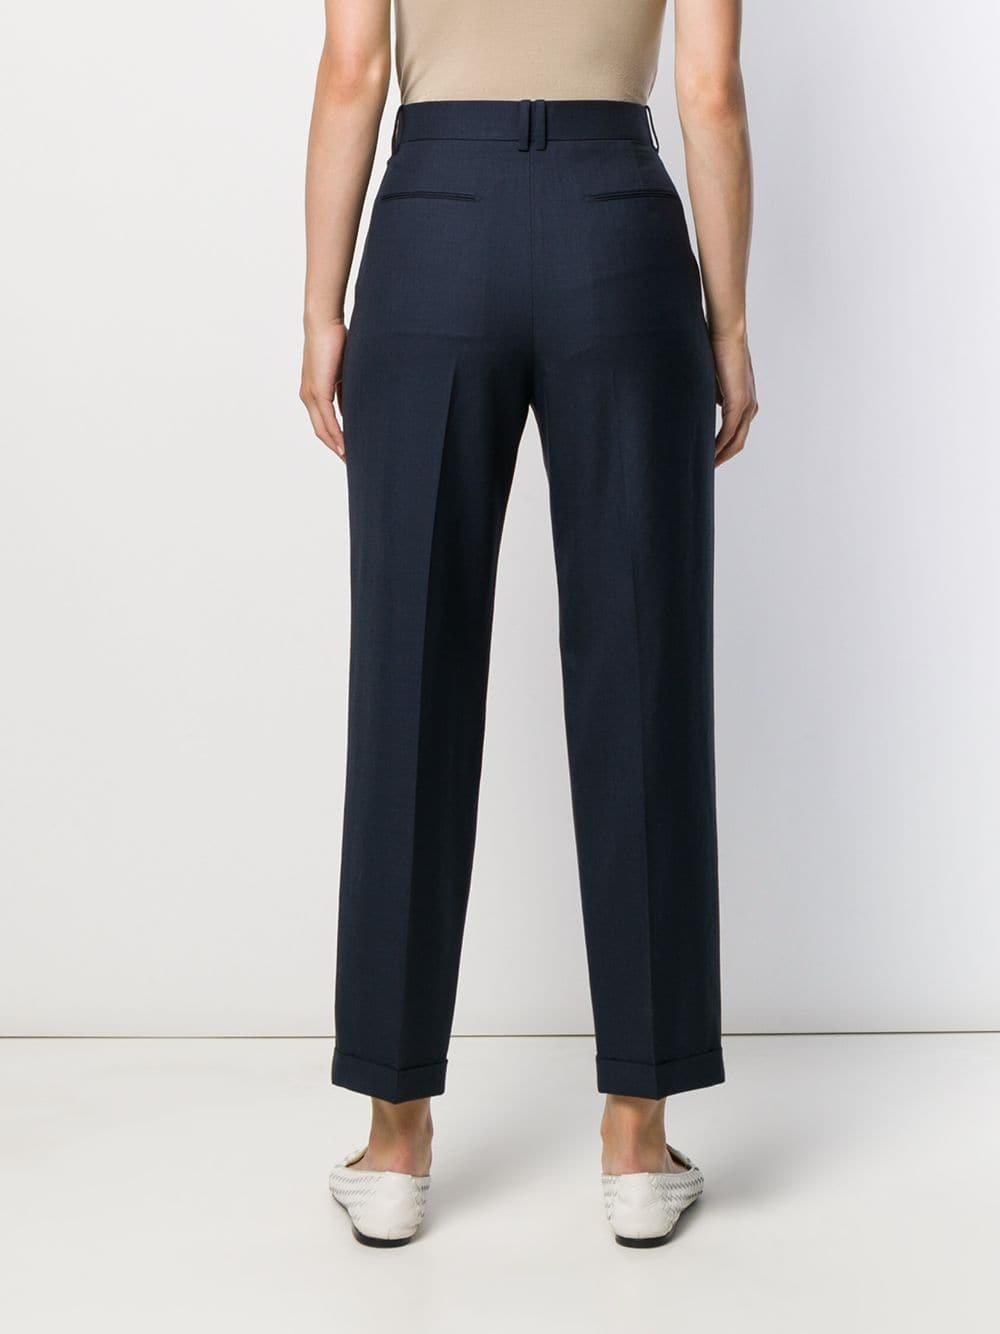 Pantalones capri de vestir The Row de Lana de color Azul